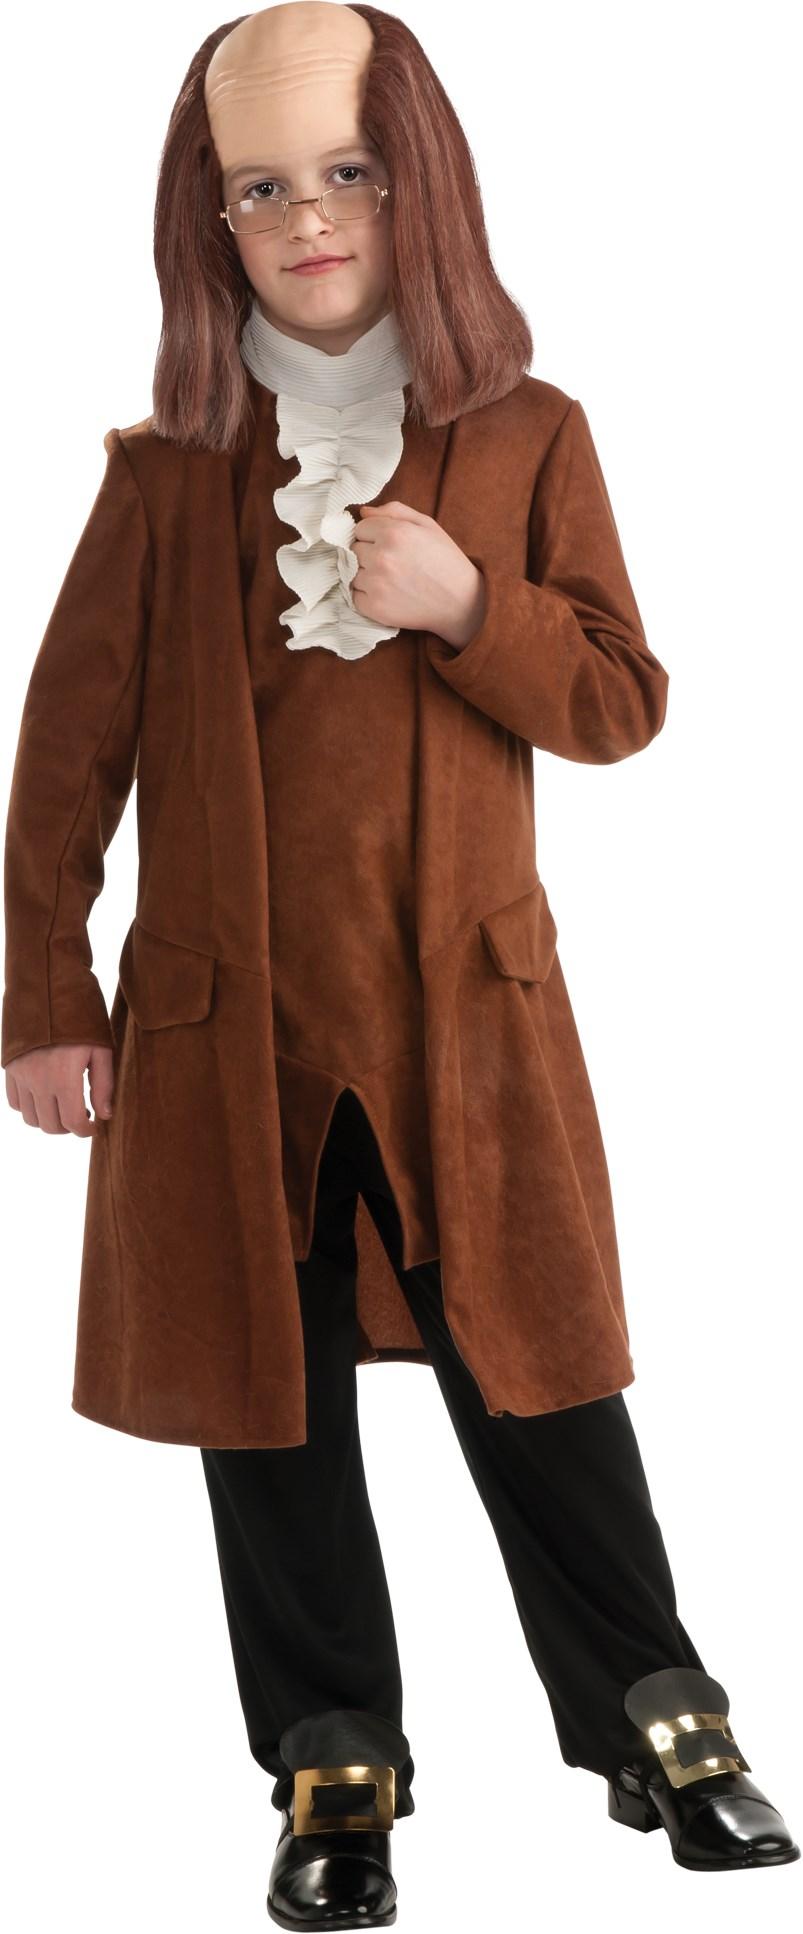 Image of Benjamin Franklin Child Costume